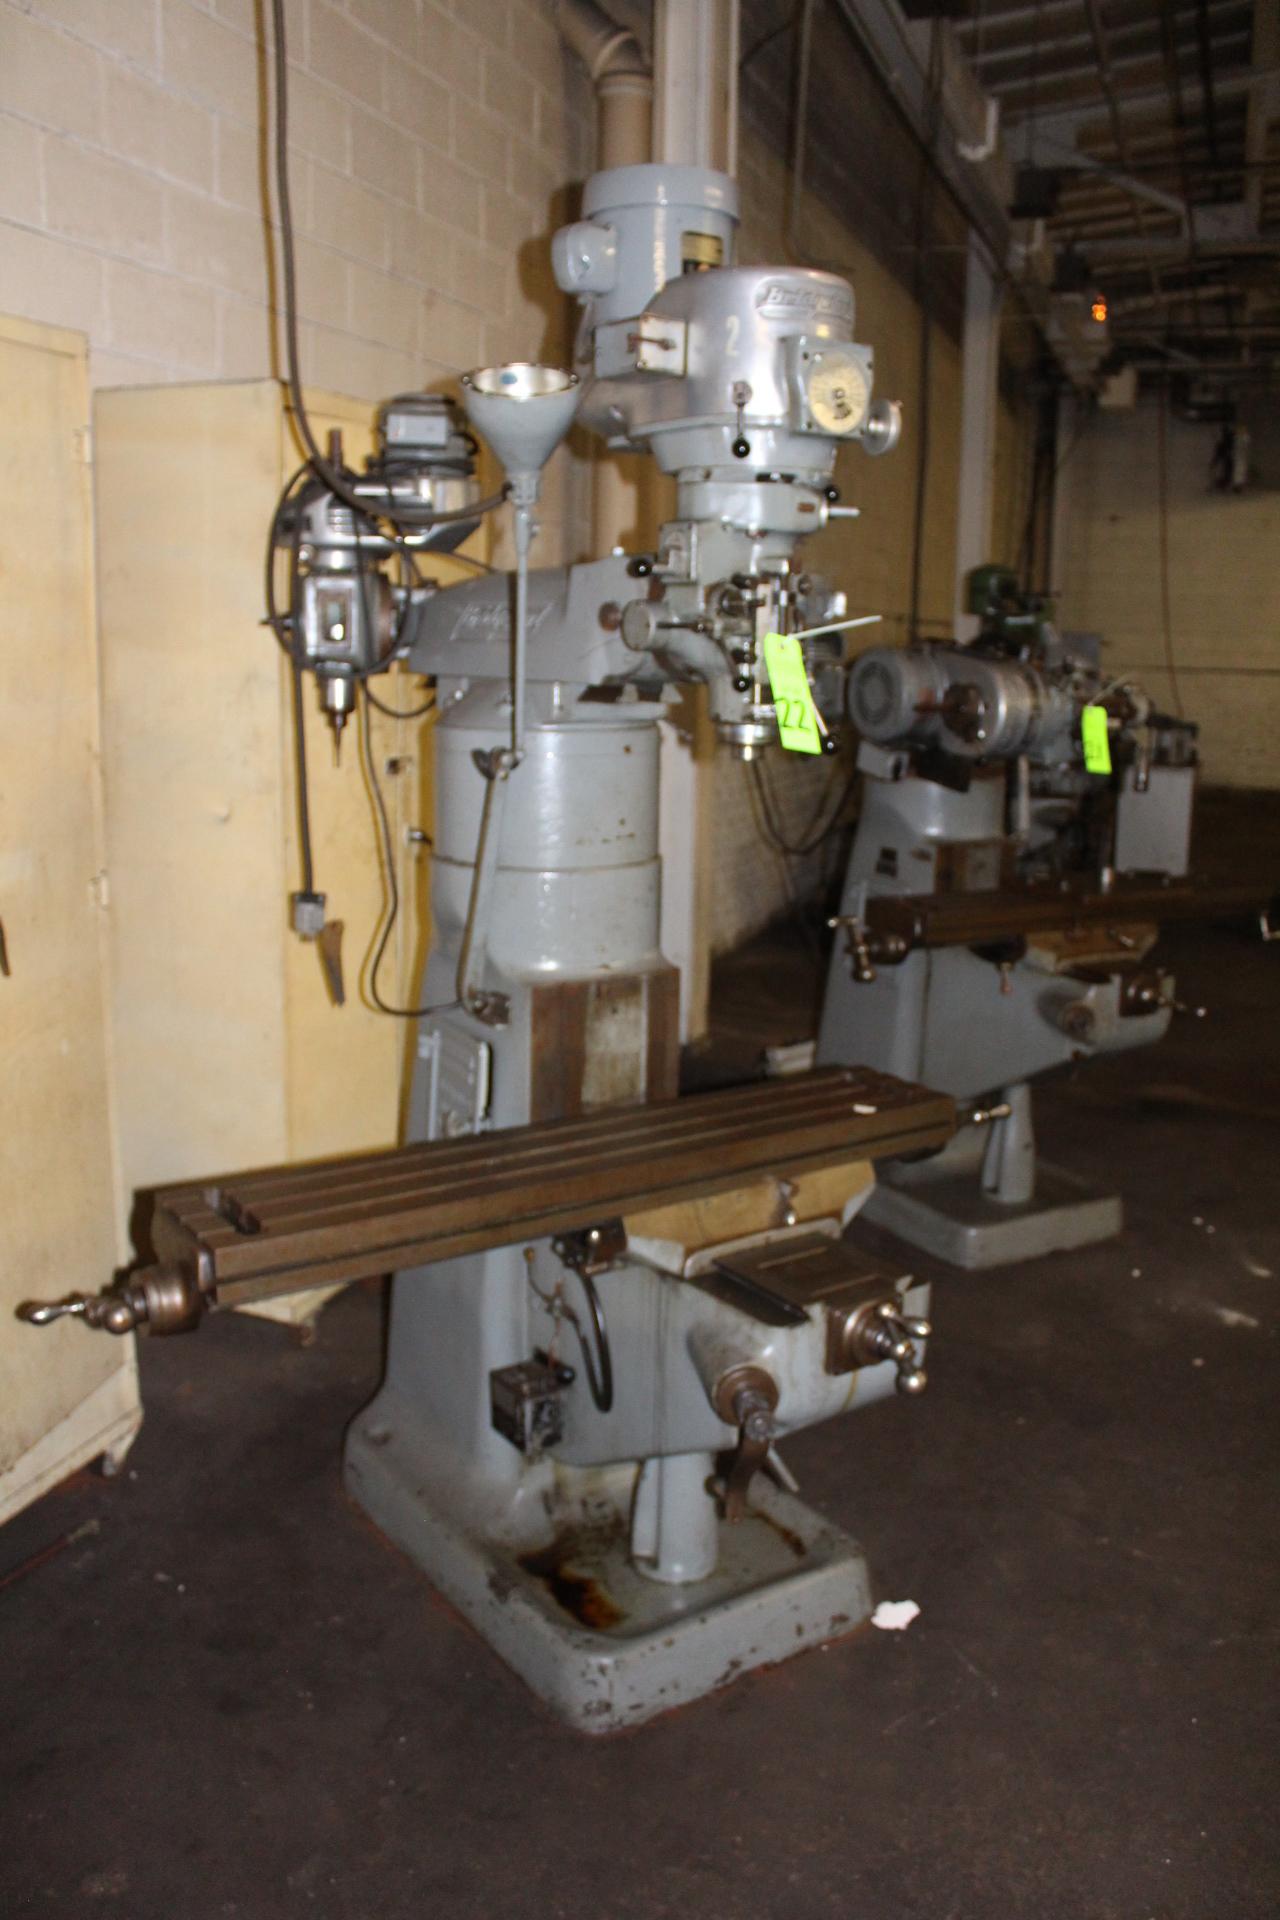 Lot 22 - Bridgeport 1-1/2 Hp Variable Speed Vertical Milling Machine